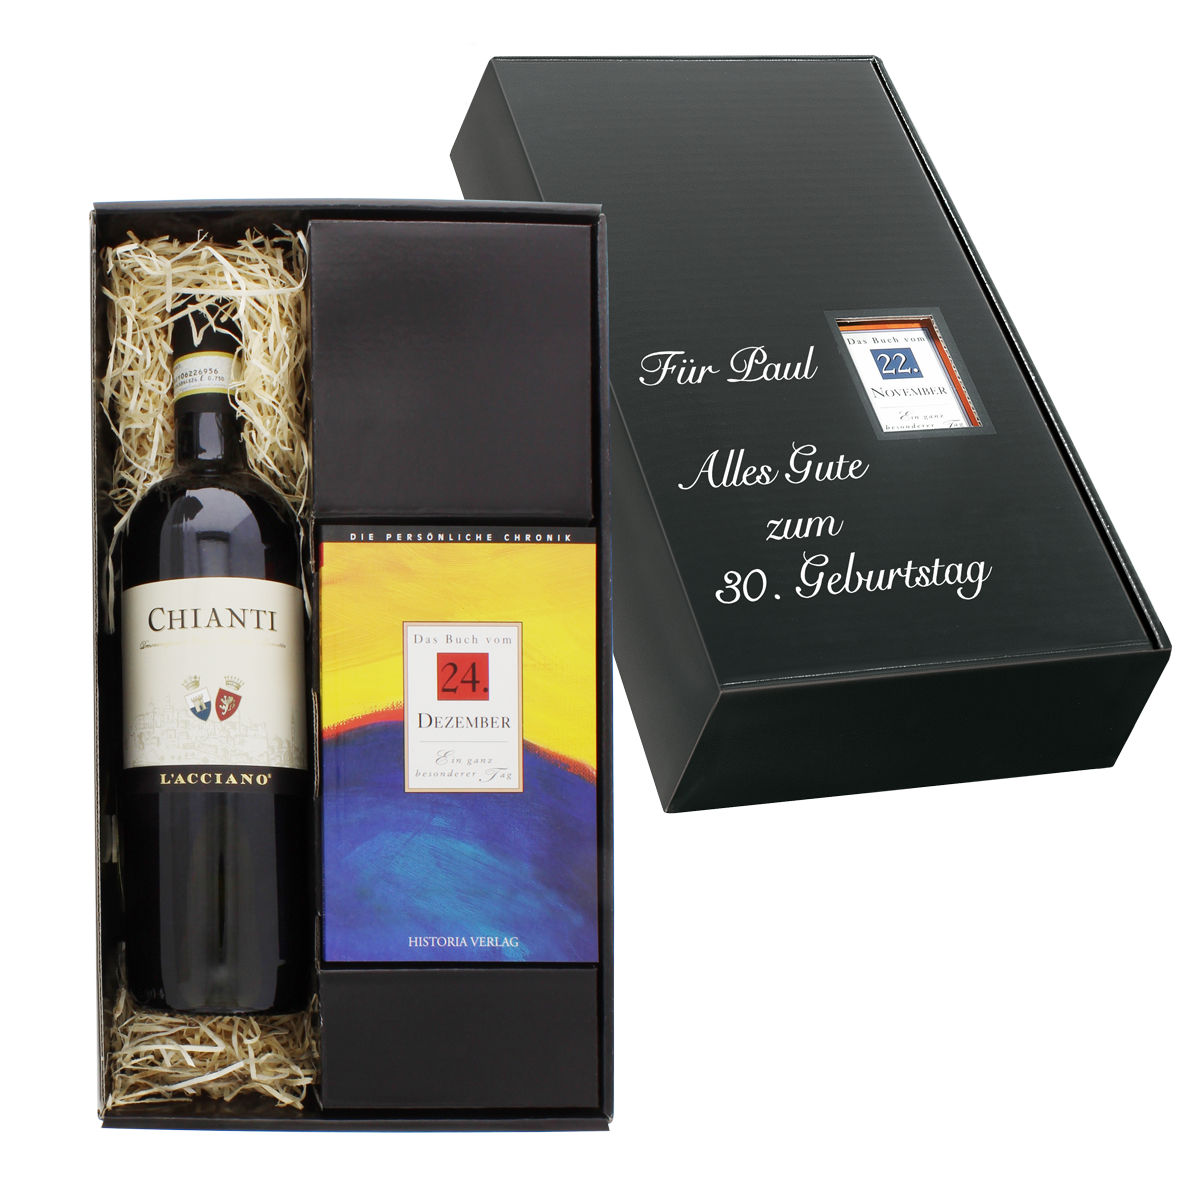 Italien-Set: Tageschronik vom 15. Januar & Chianti-Wein